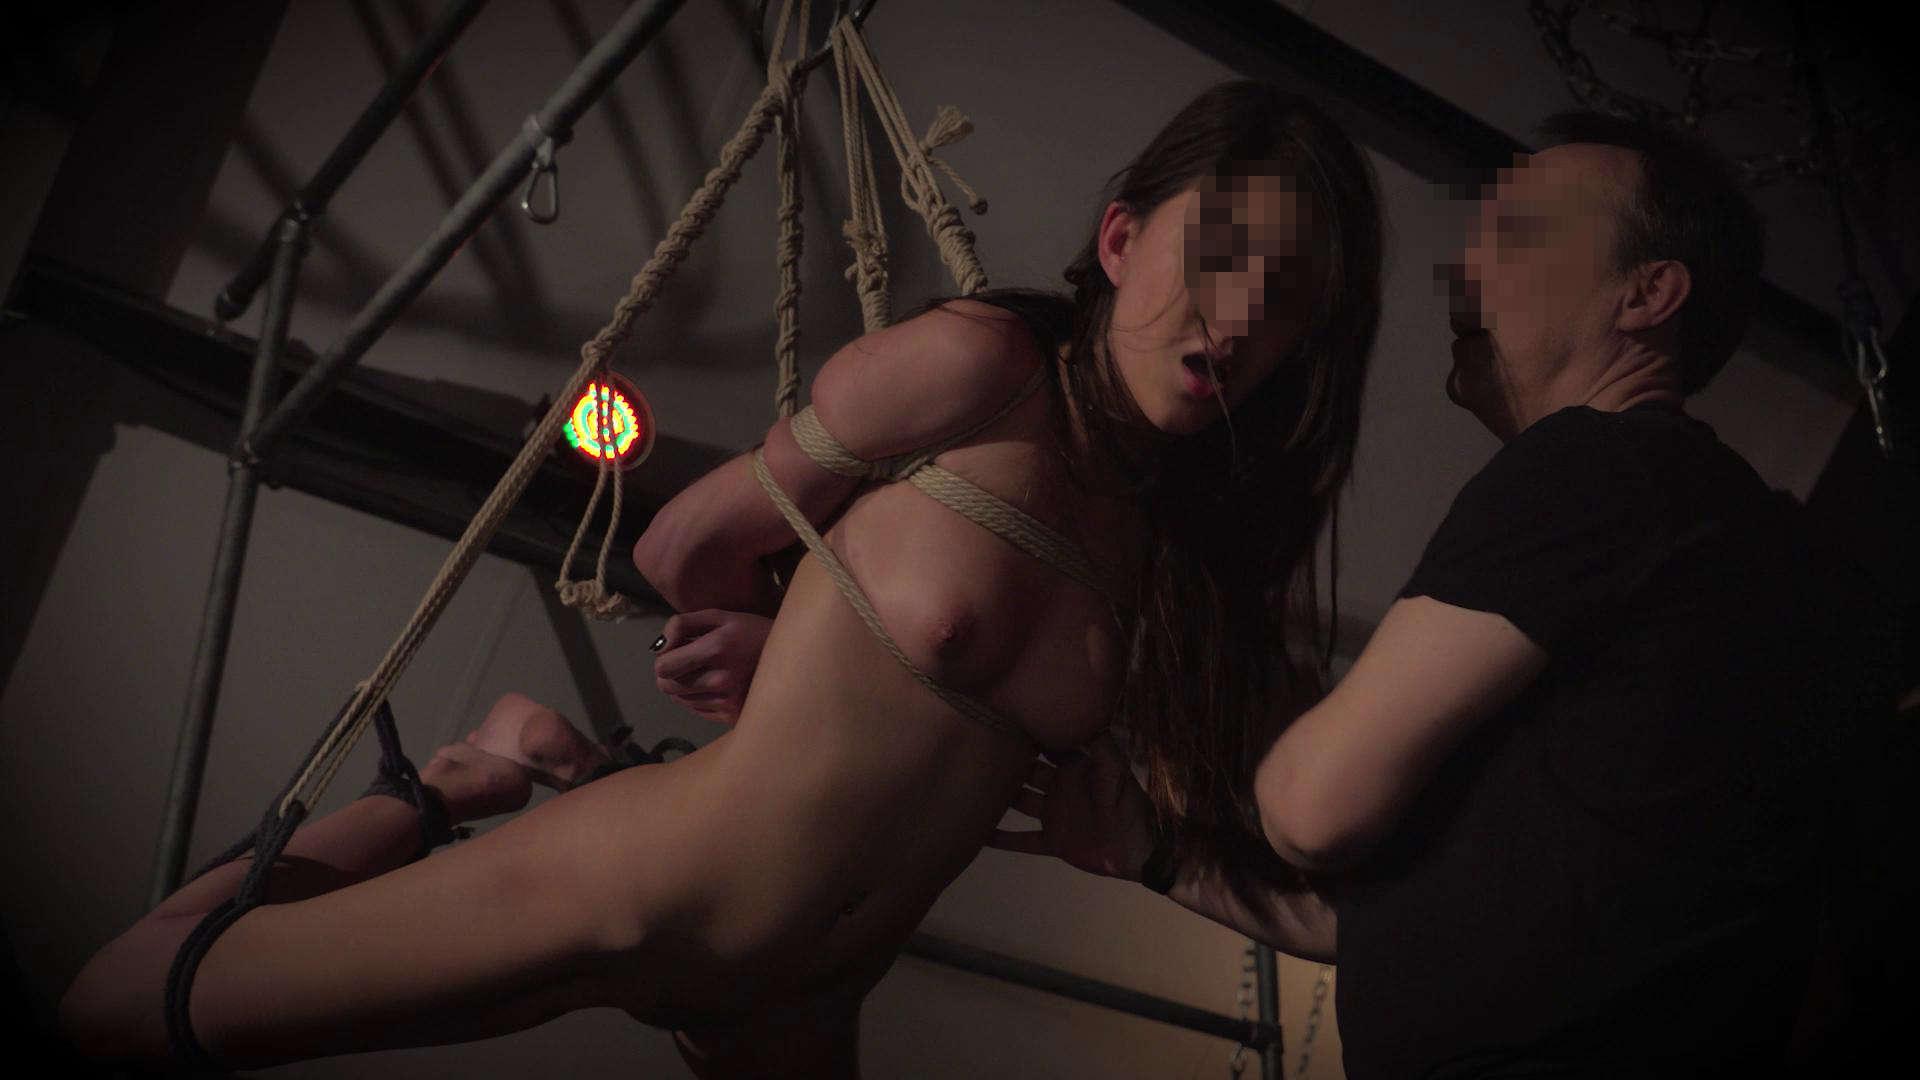 schiava cerca padrone bondage